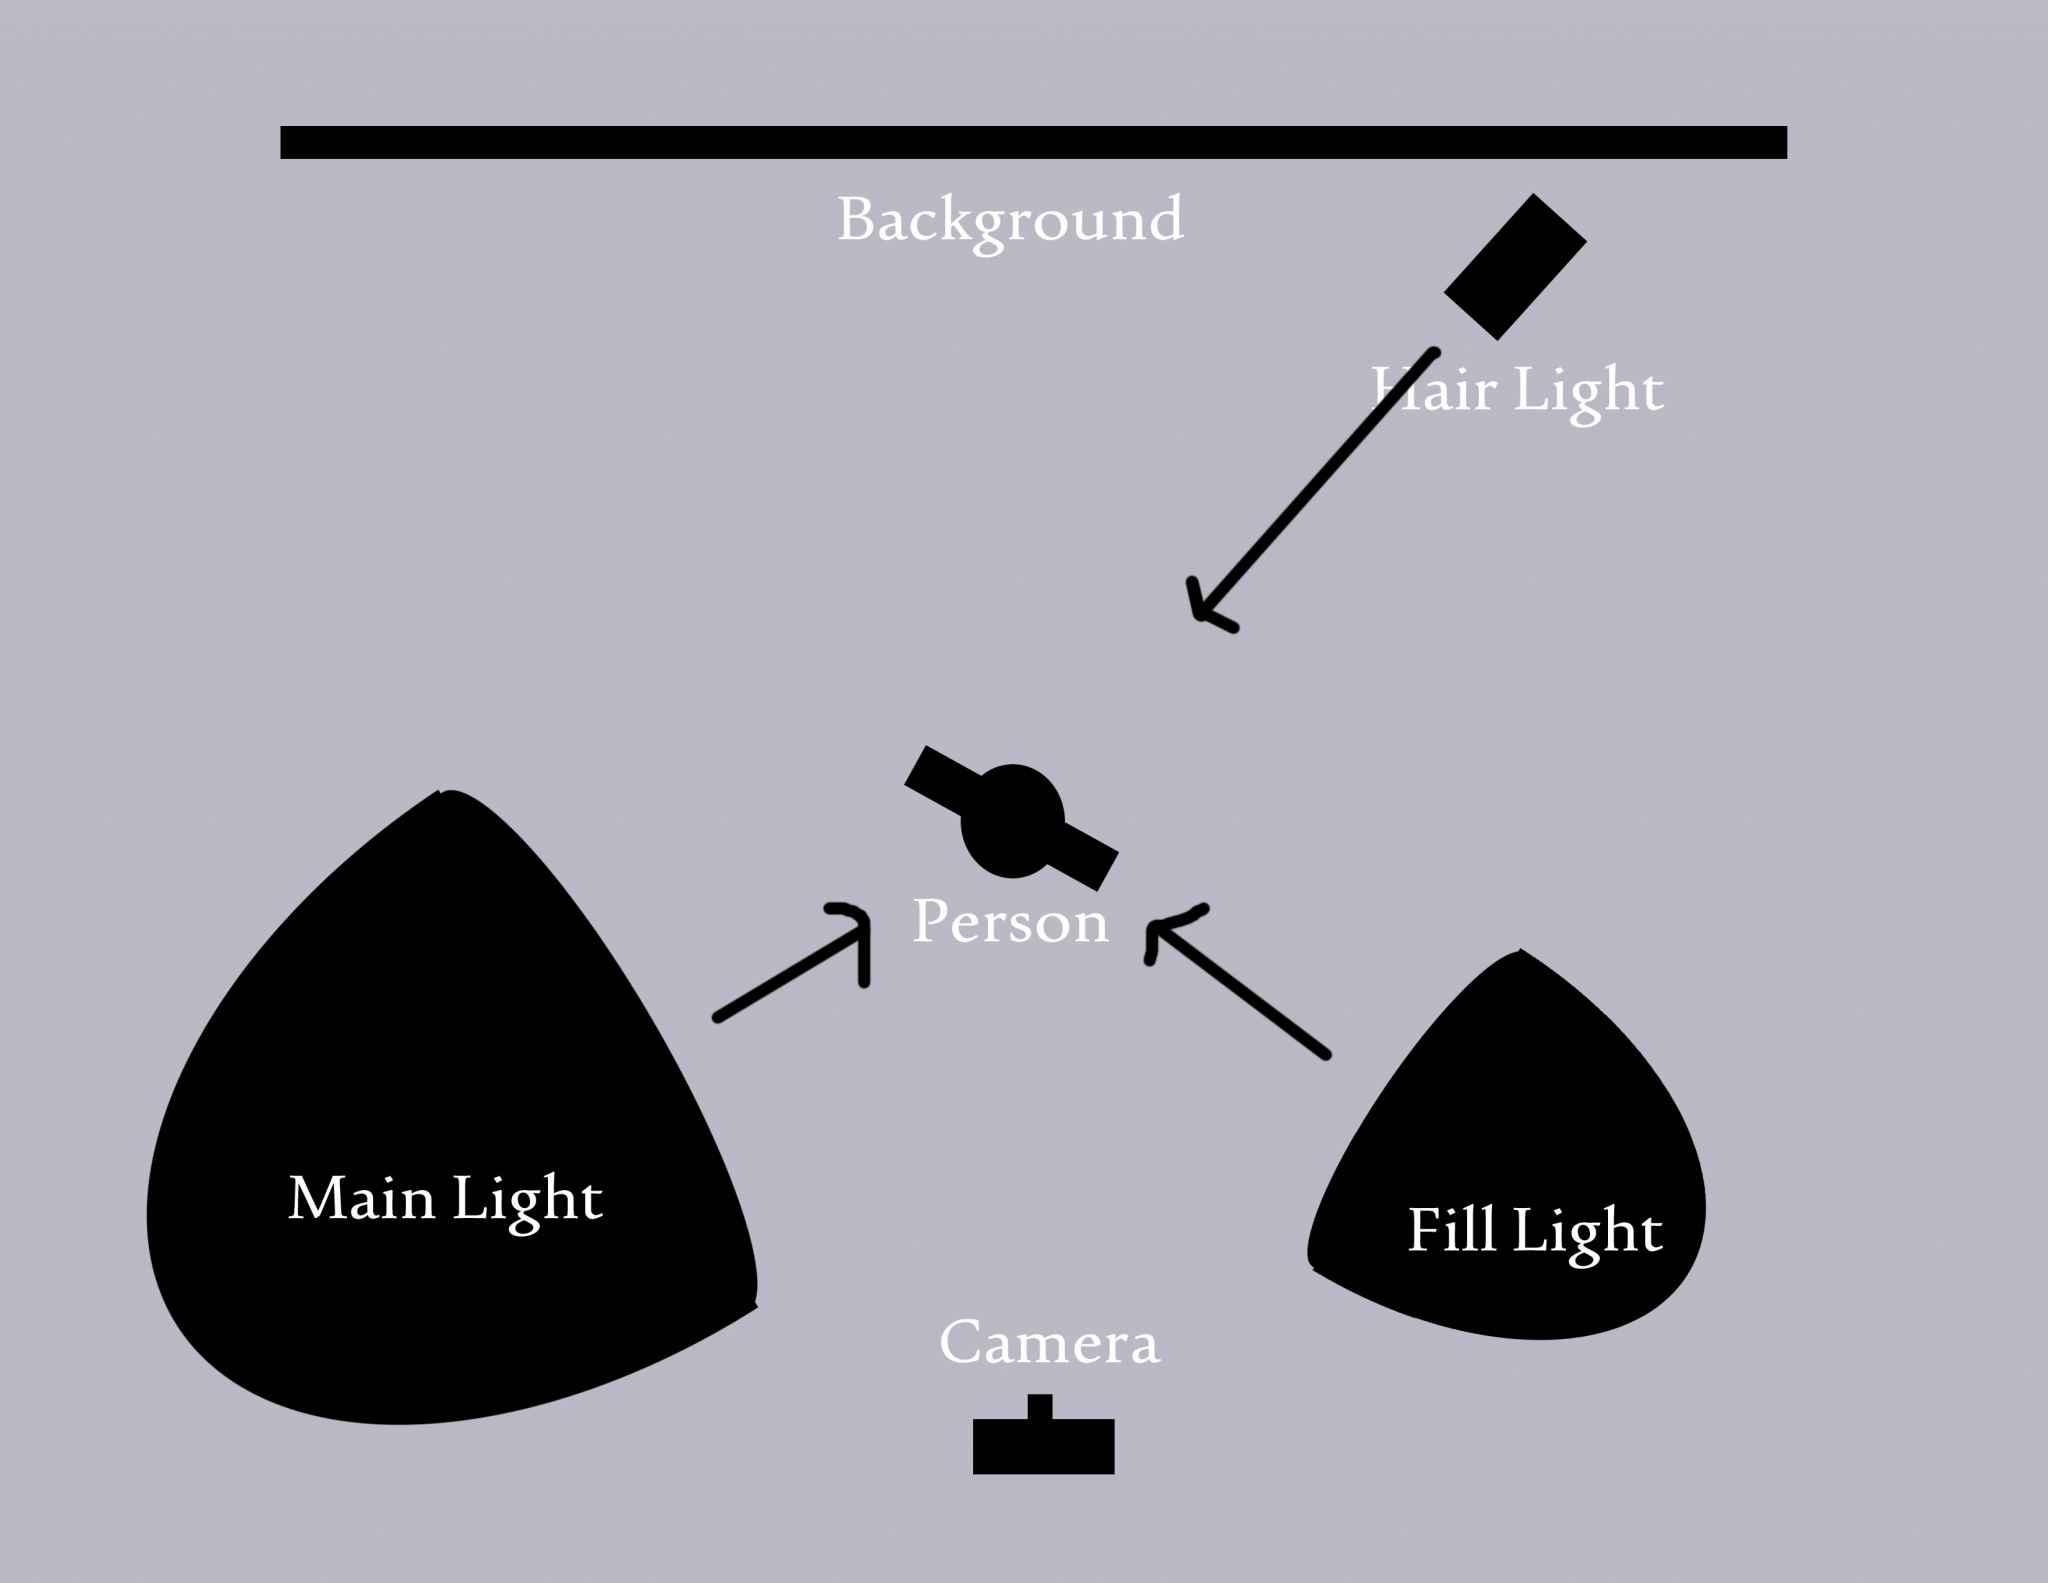 School Portraits - Lighting Diagram - Processing - Eldon Yoder